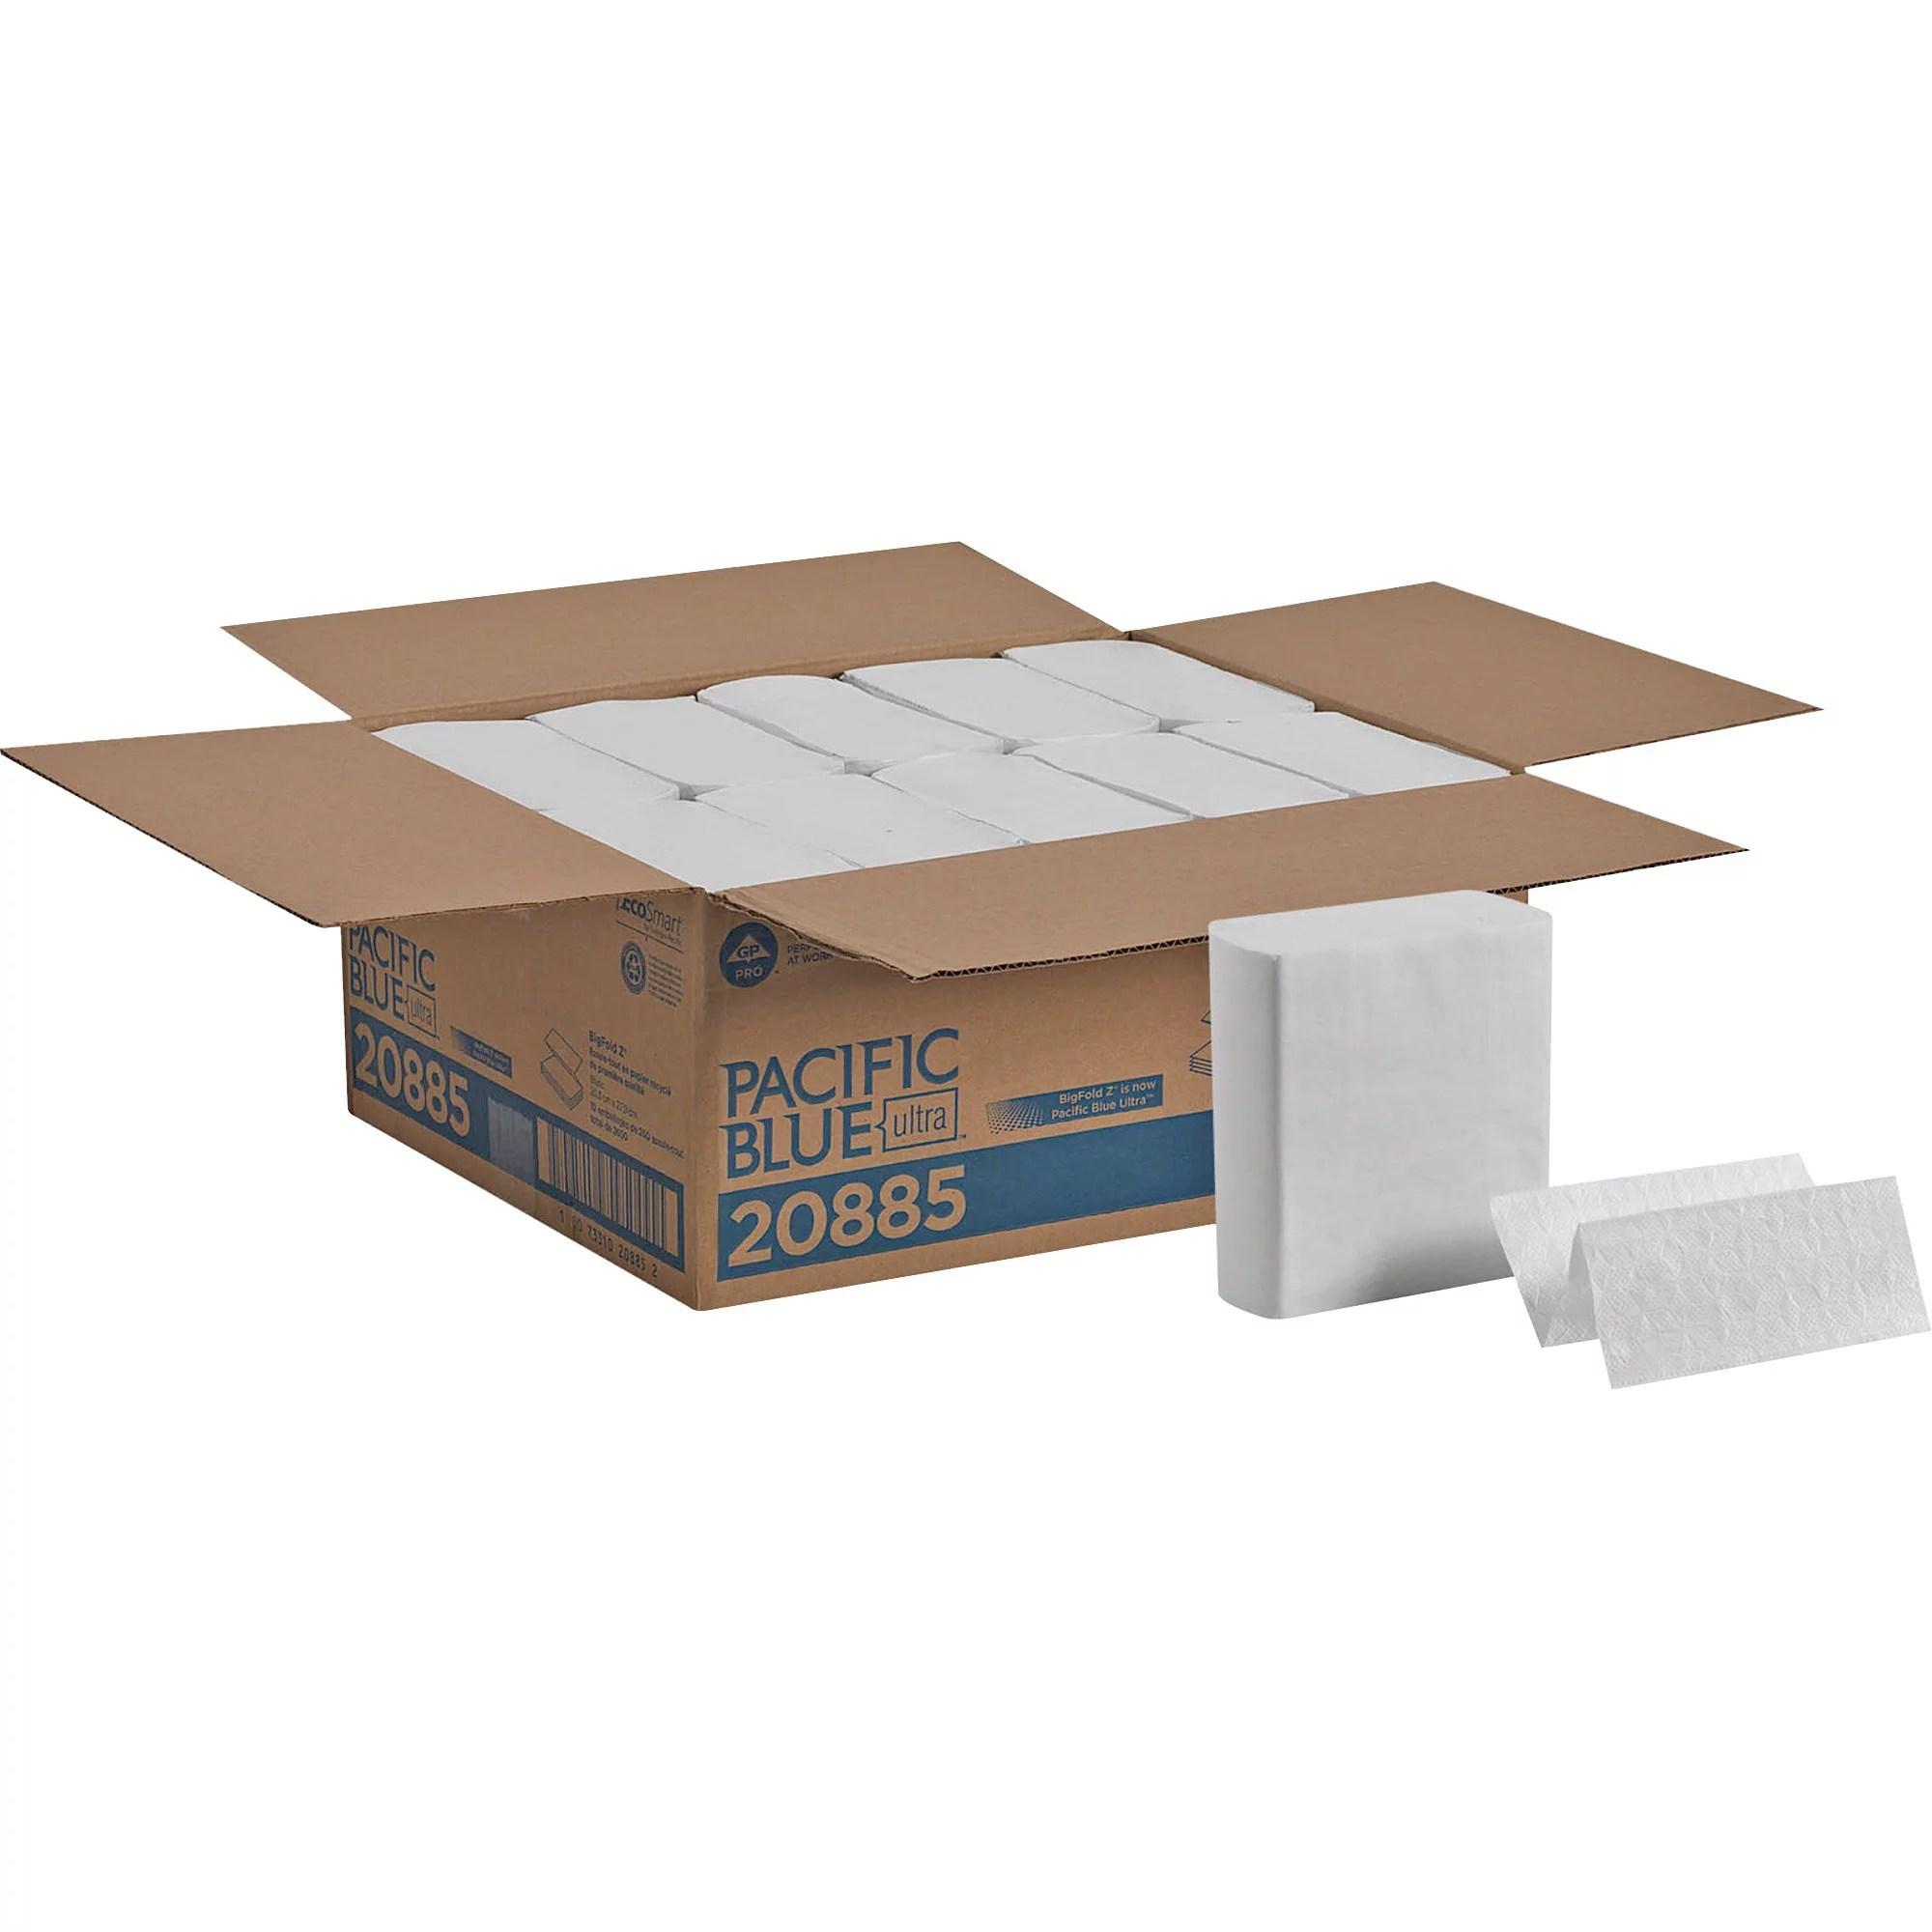 Pacific Blue Ultra, GPC20885, Z-Fold Paper Towel by GP PRO, 2600 / Carton, White